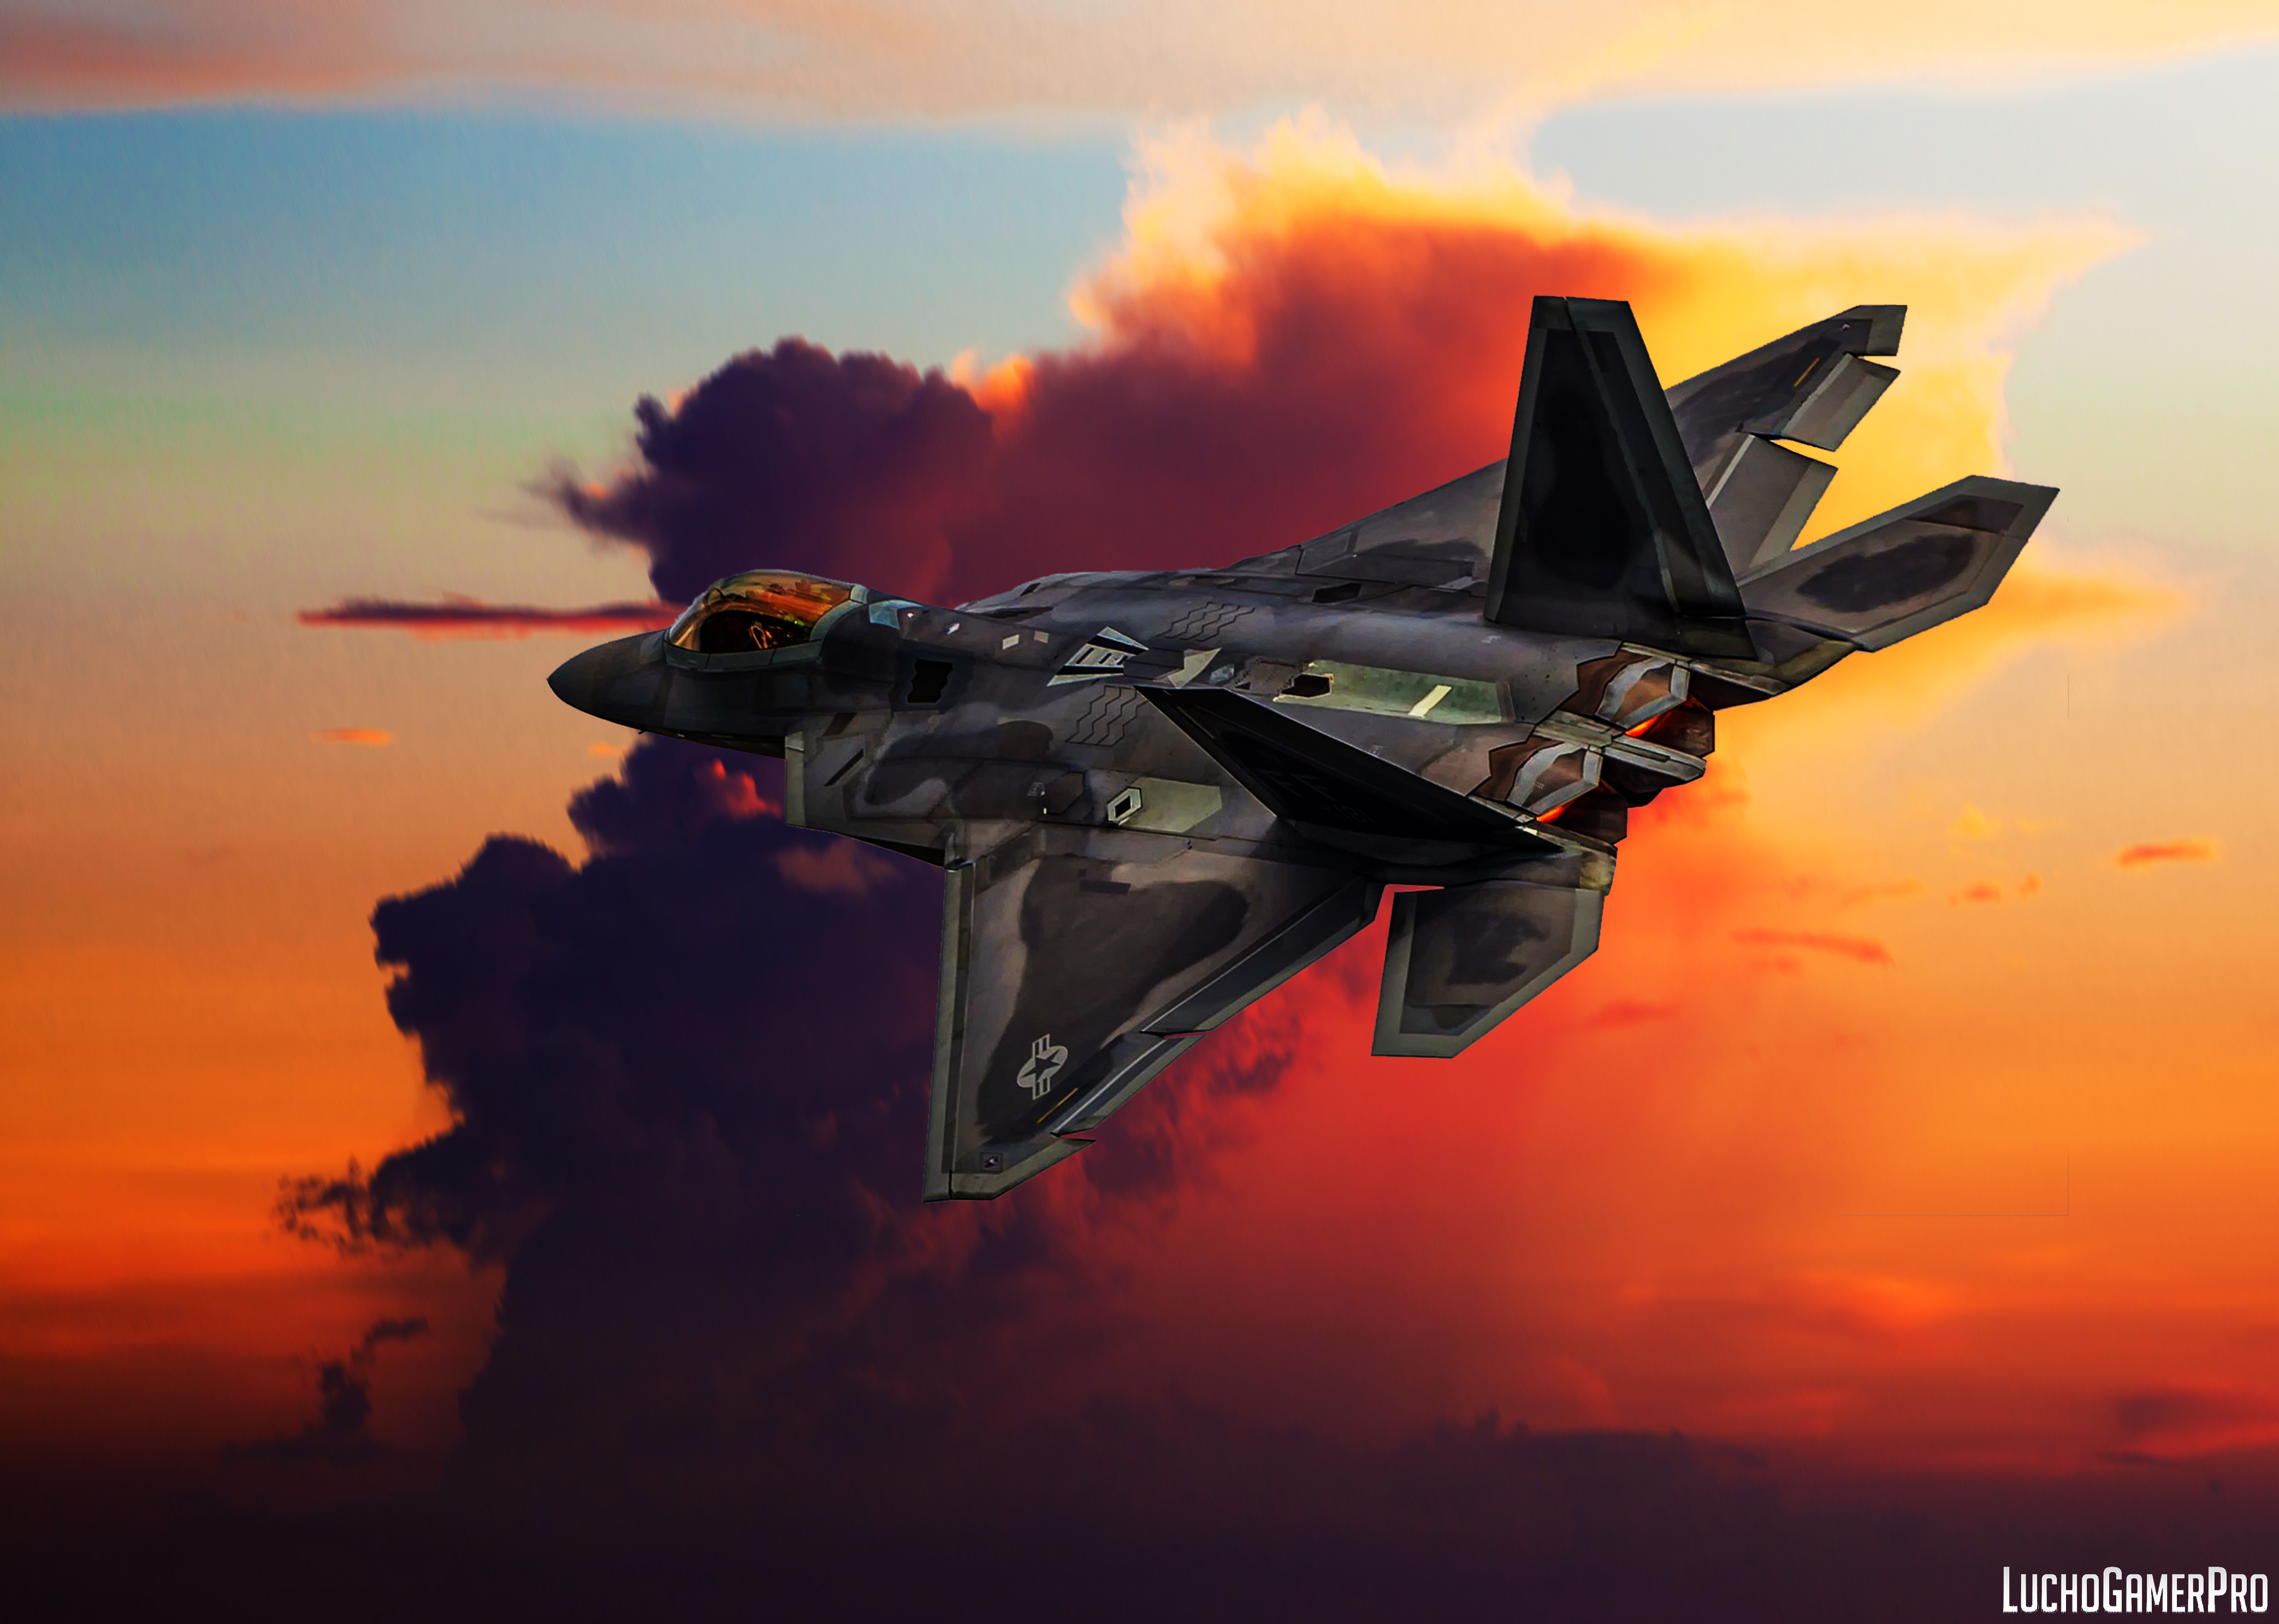 F 22 Raptor Wallpaper: F-22 Raptor By LuchoGamerPro On DeviantArt